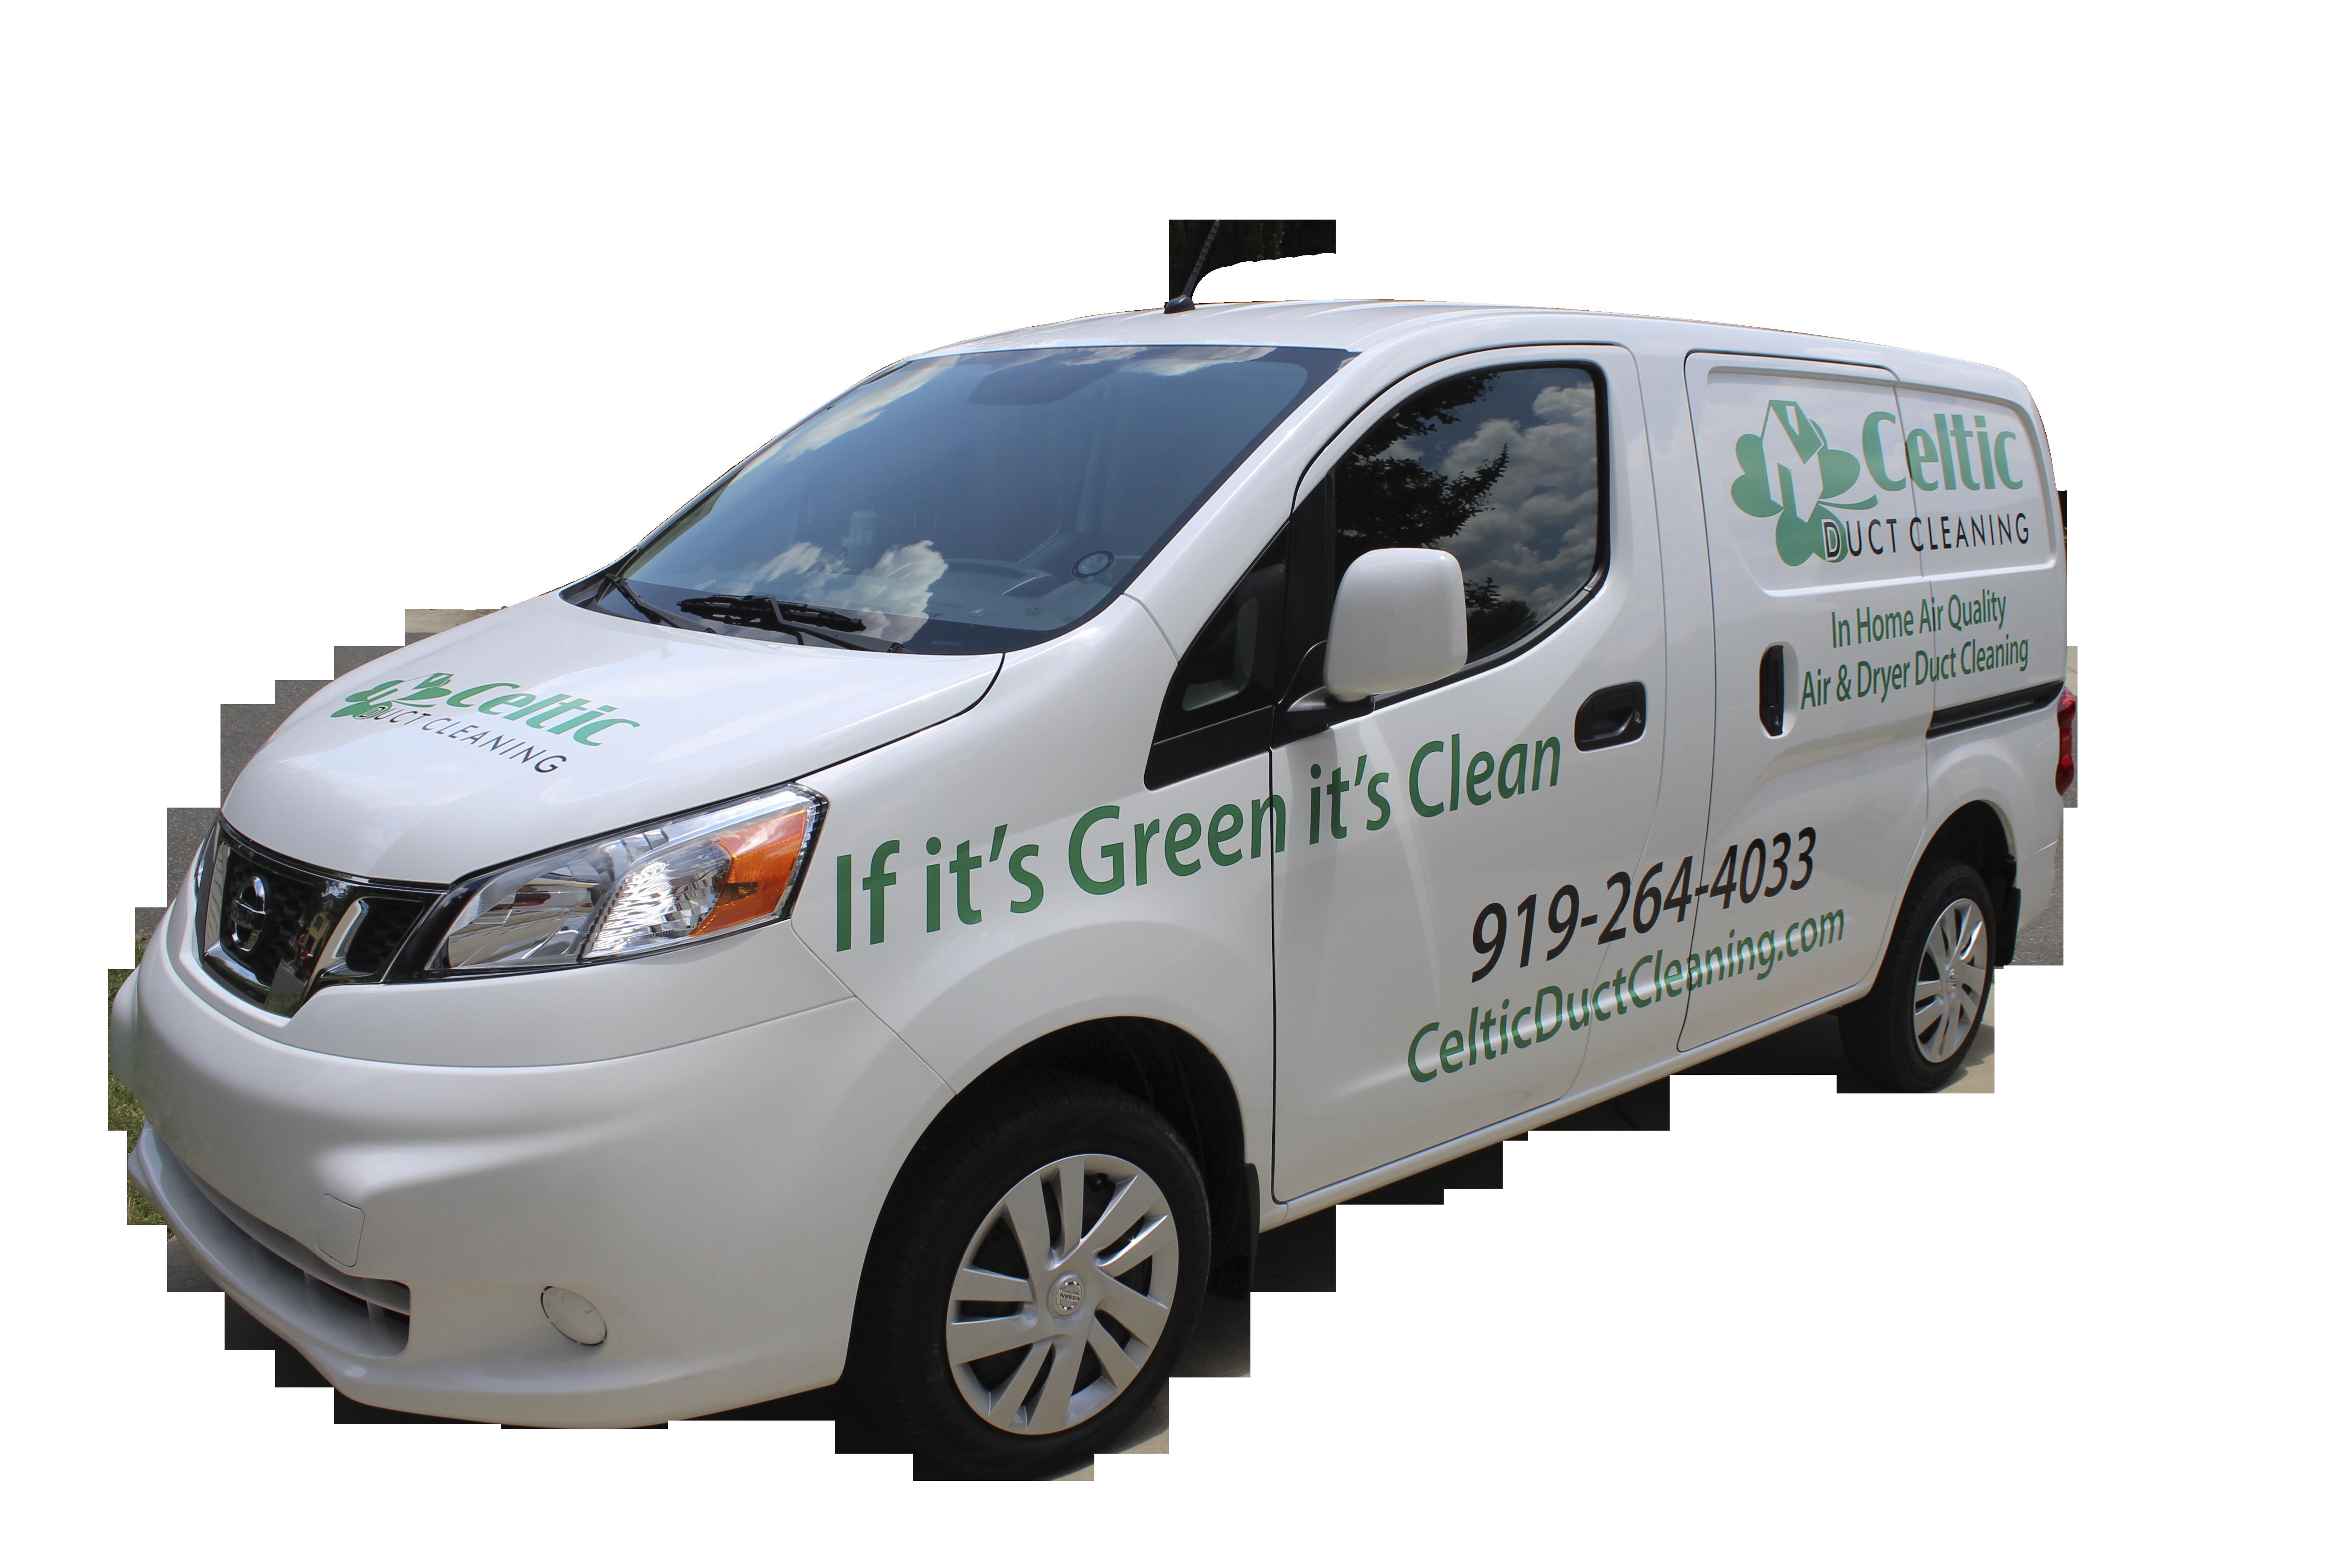 Celtic Van